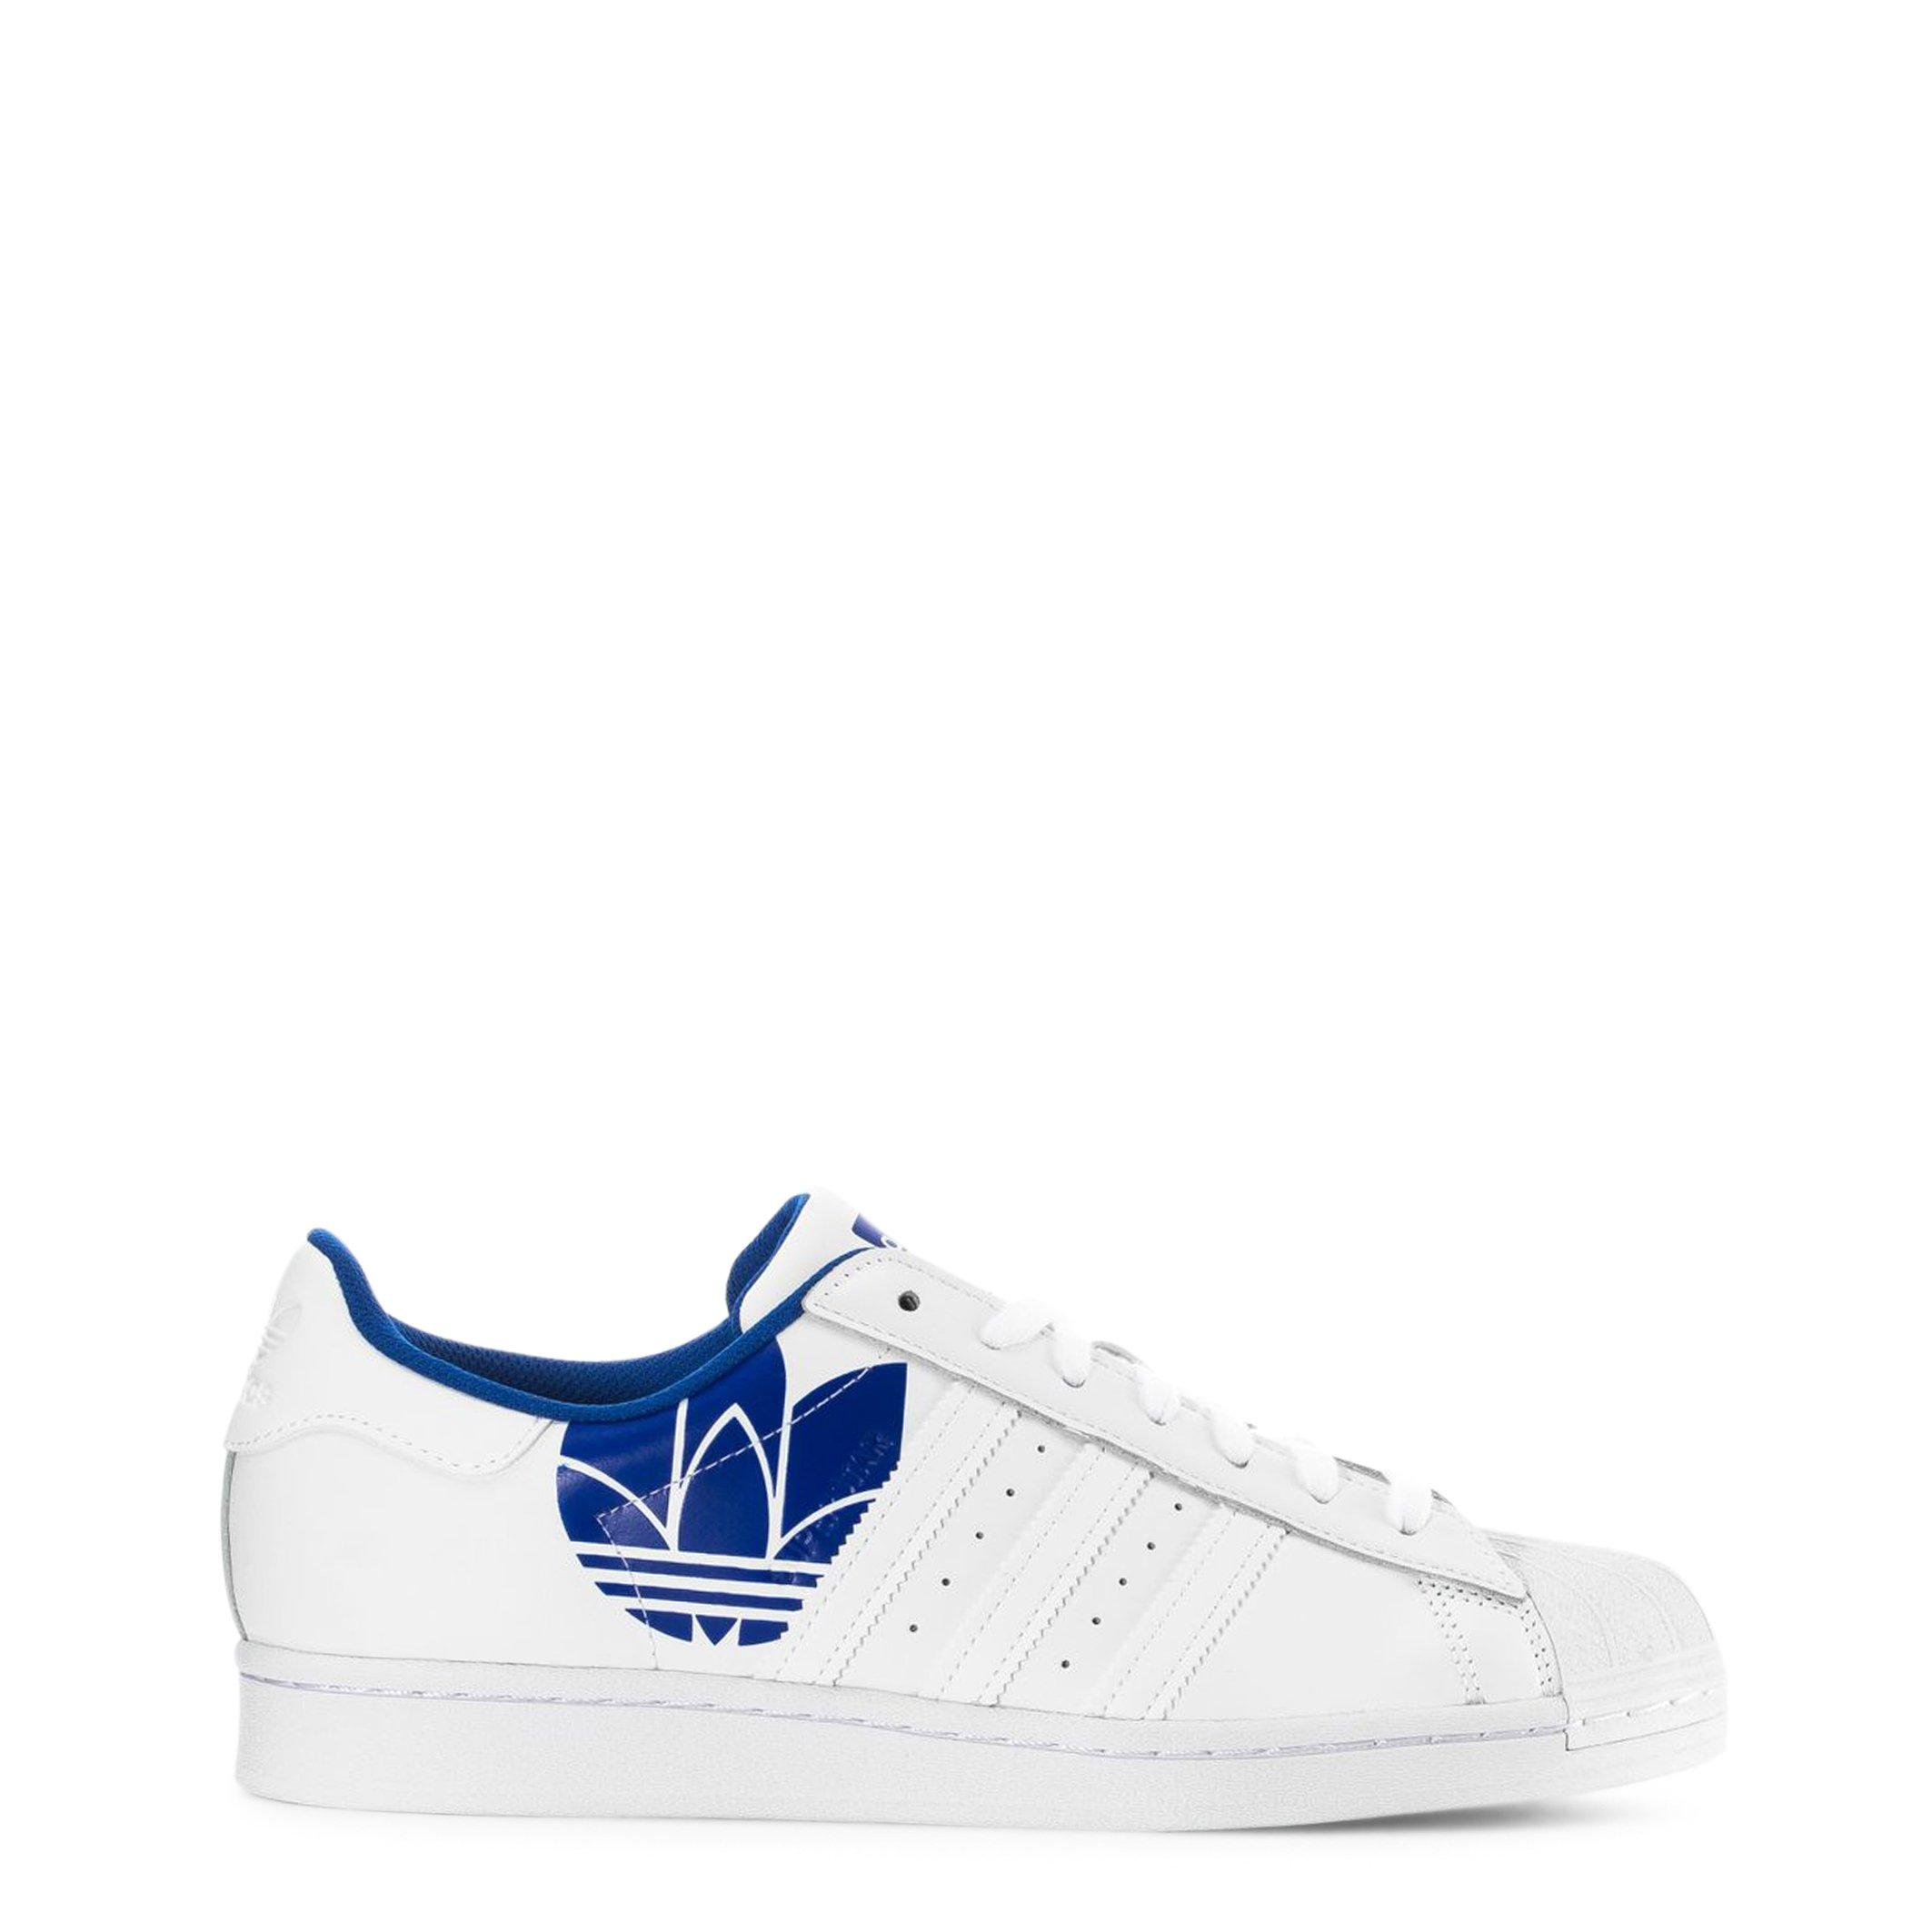 Adidas Women's Trainer Various Colours Superstar - white-3 UK 3.5